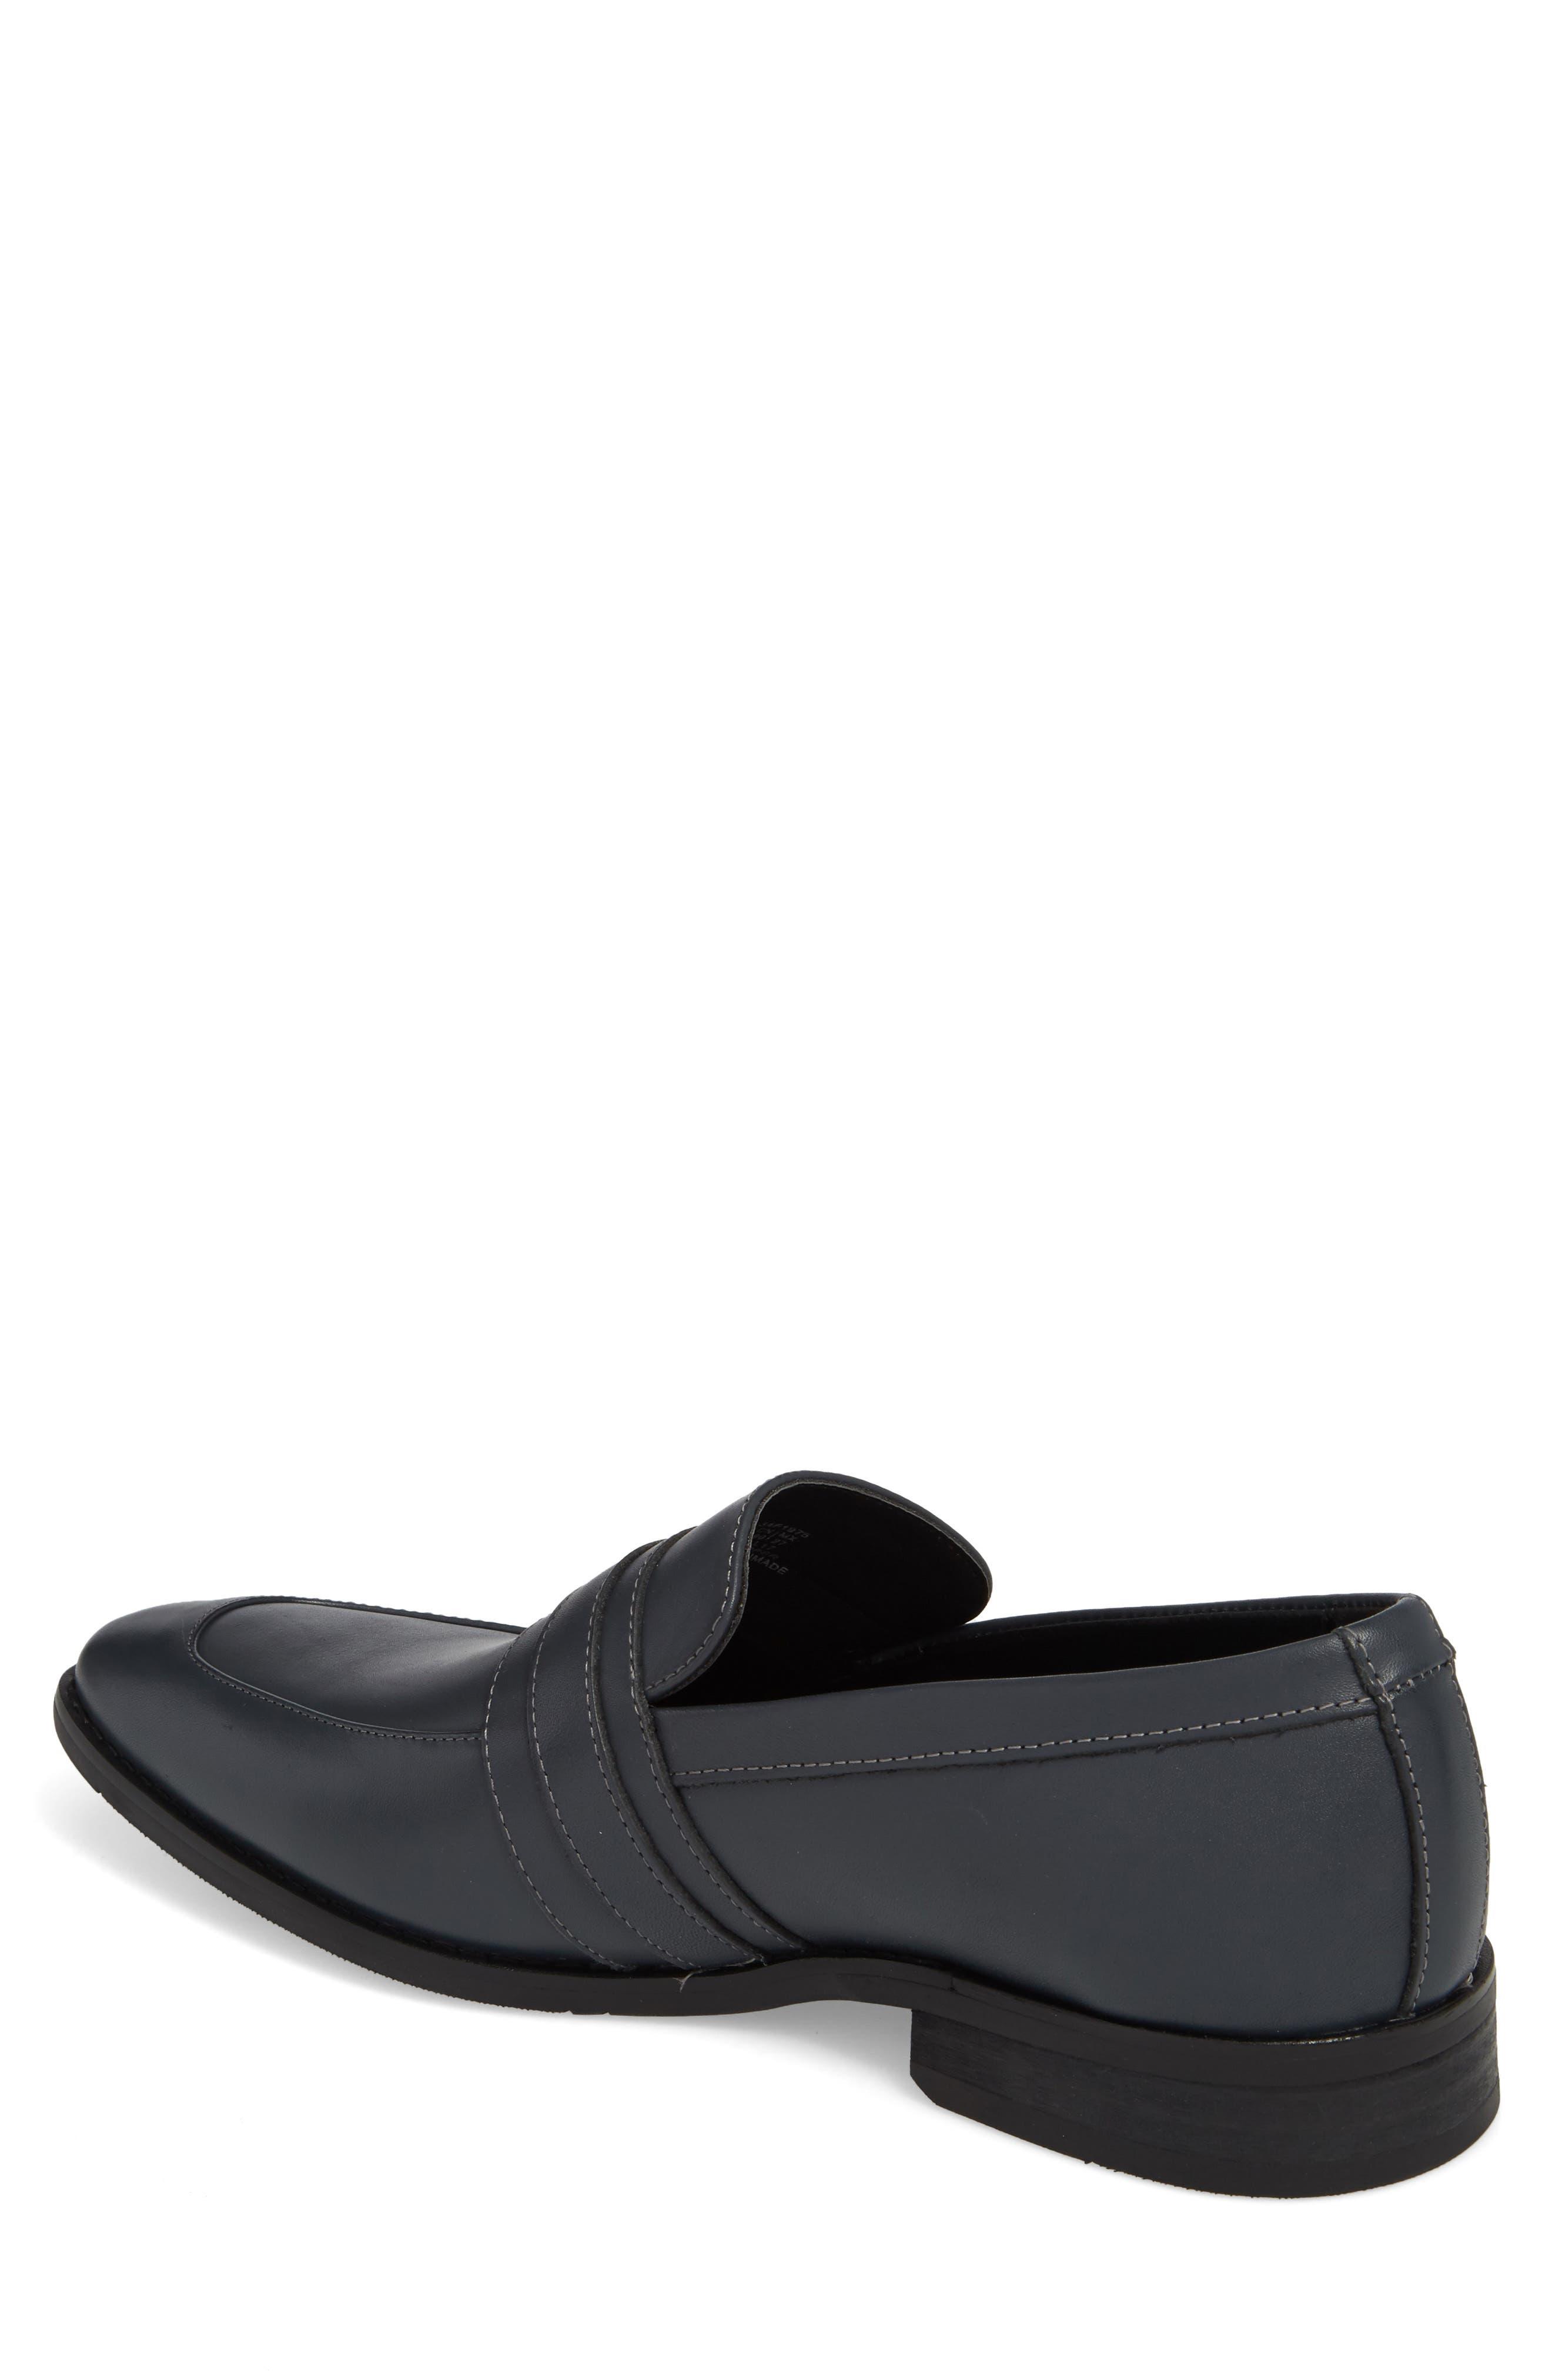 Alternate Image 2  - Calvin Klein Reyes Loafer (Men)